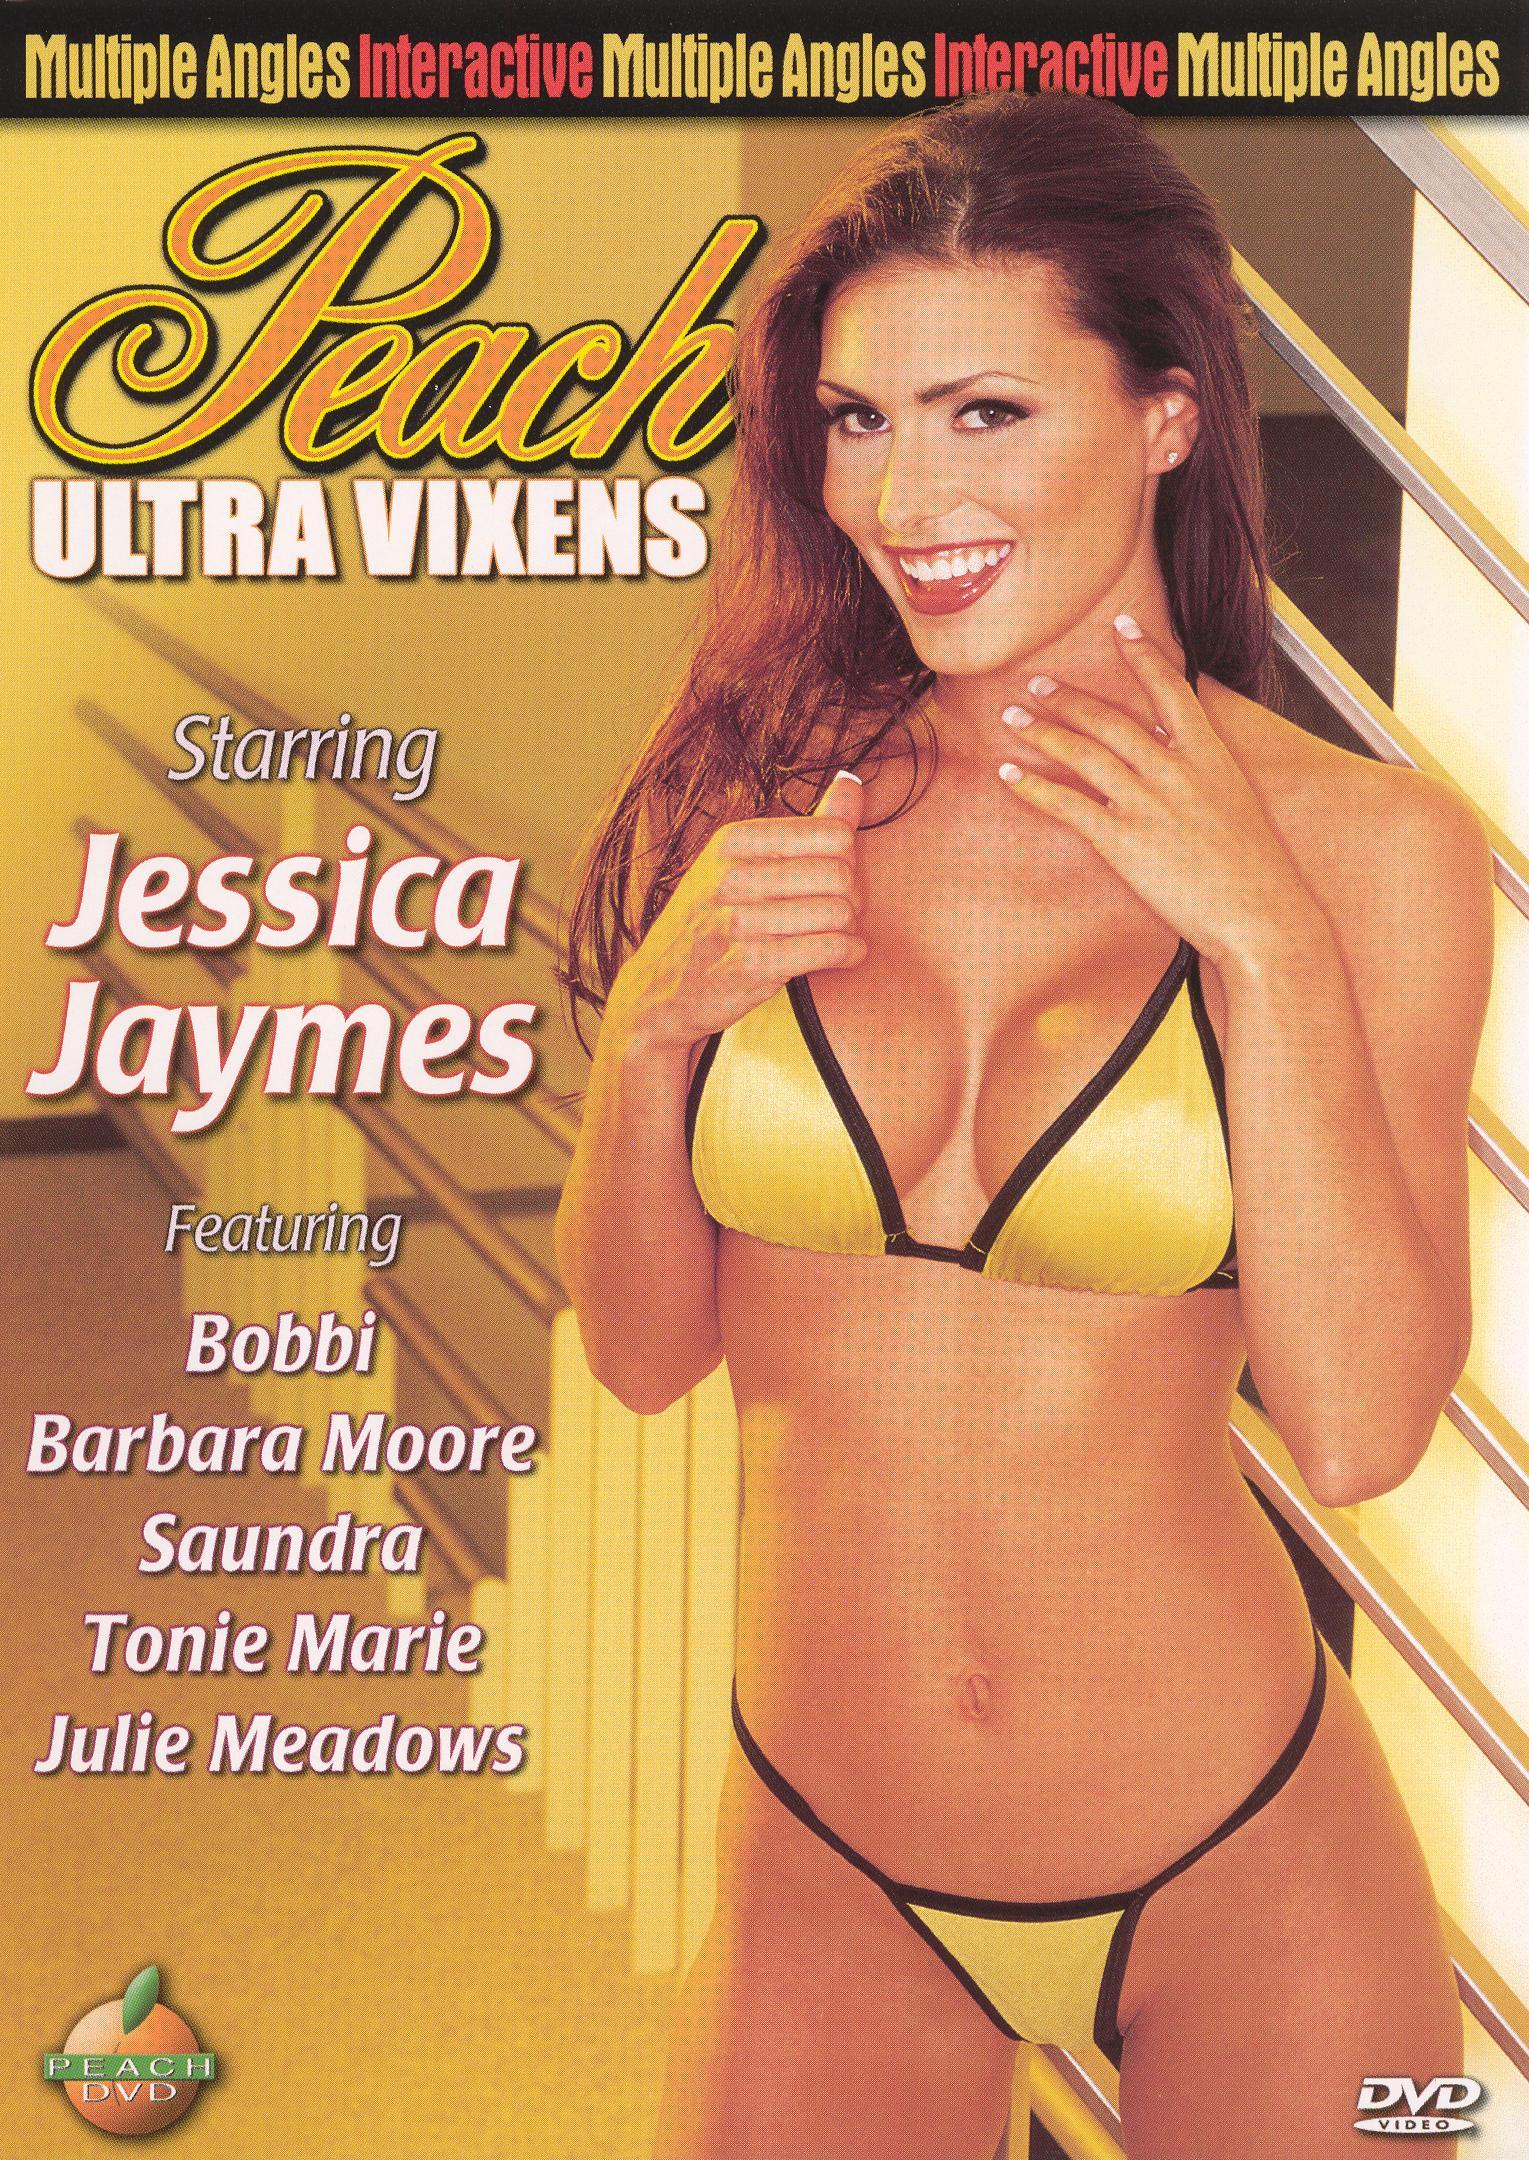 Peach Ultra Vixens: Jessica Jaymes